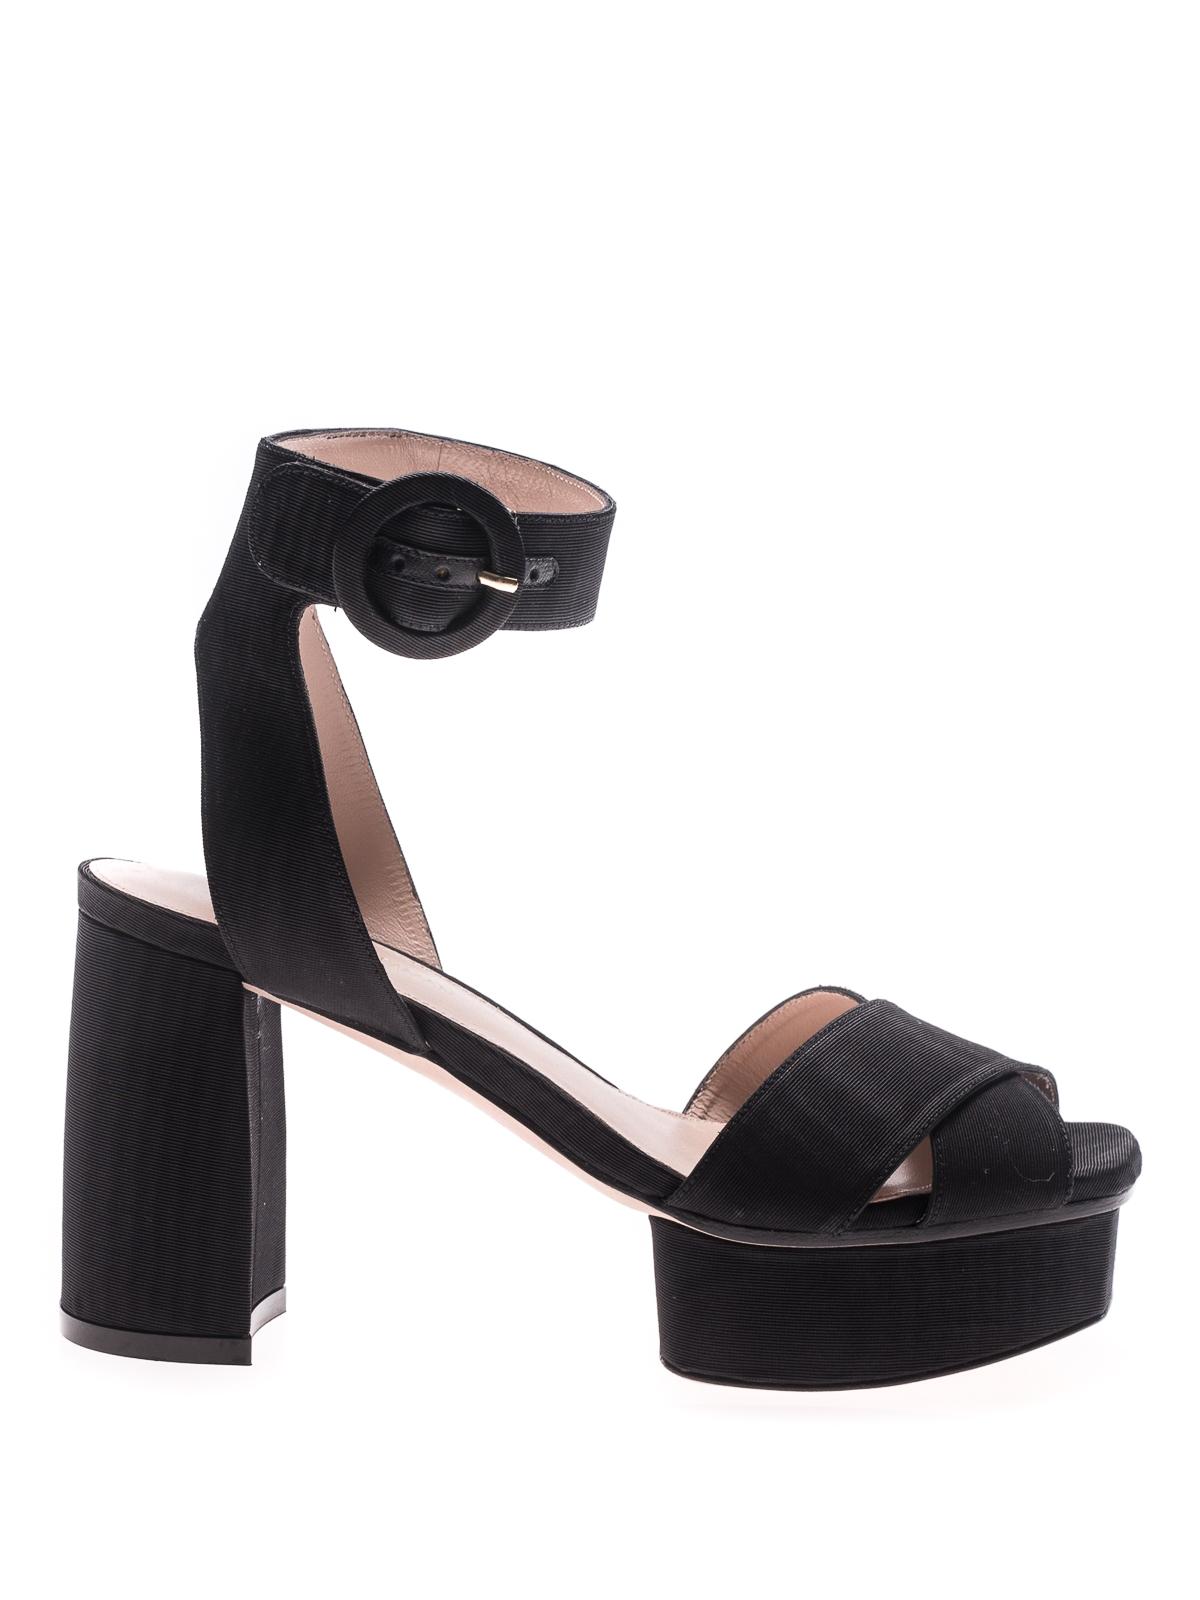 Carmina black platform sandals